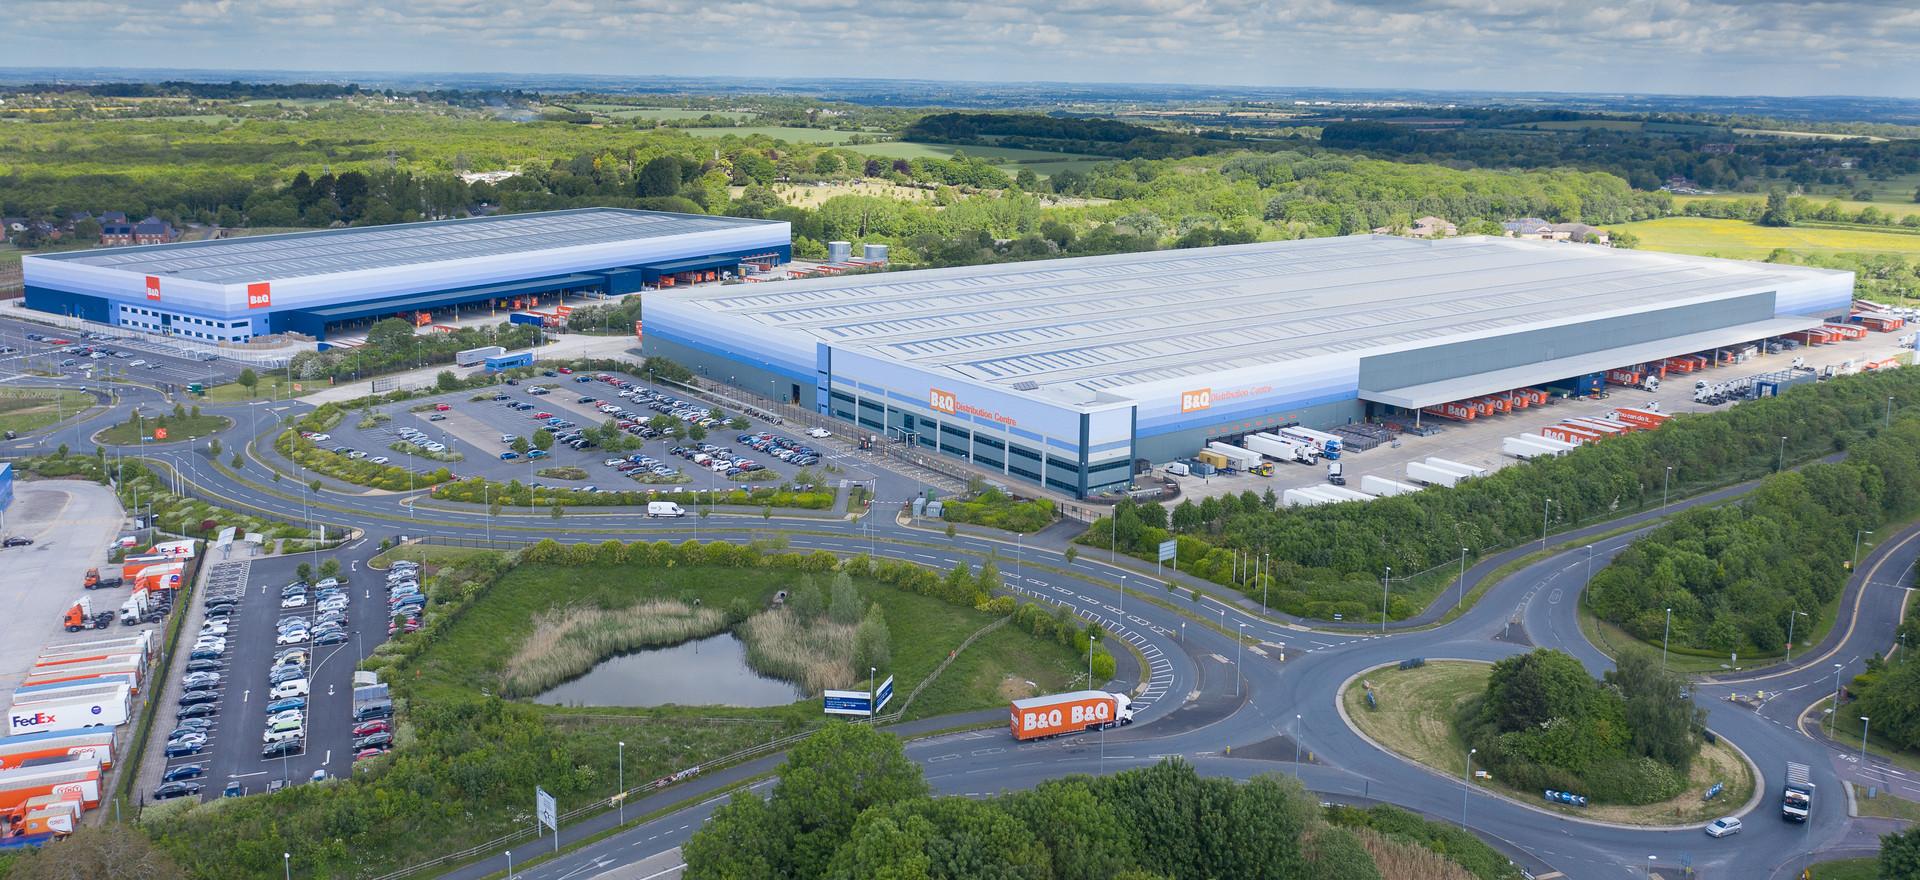 B&q Distribution Centre-Swindon.jpg